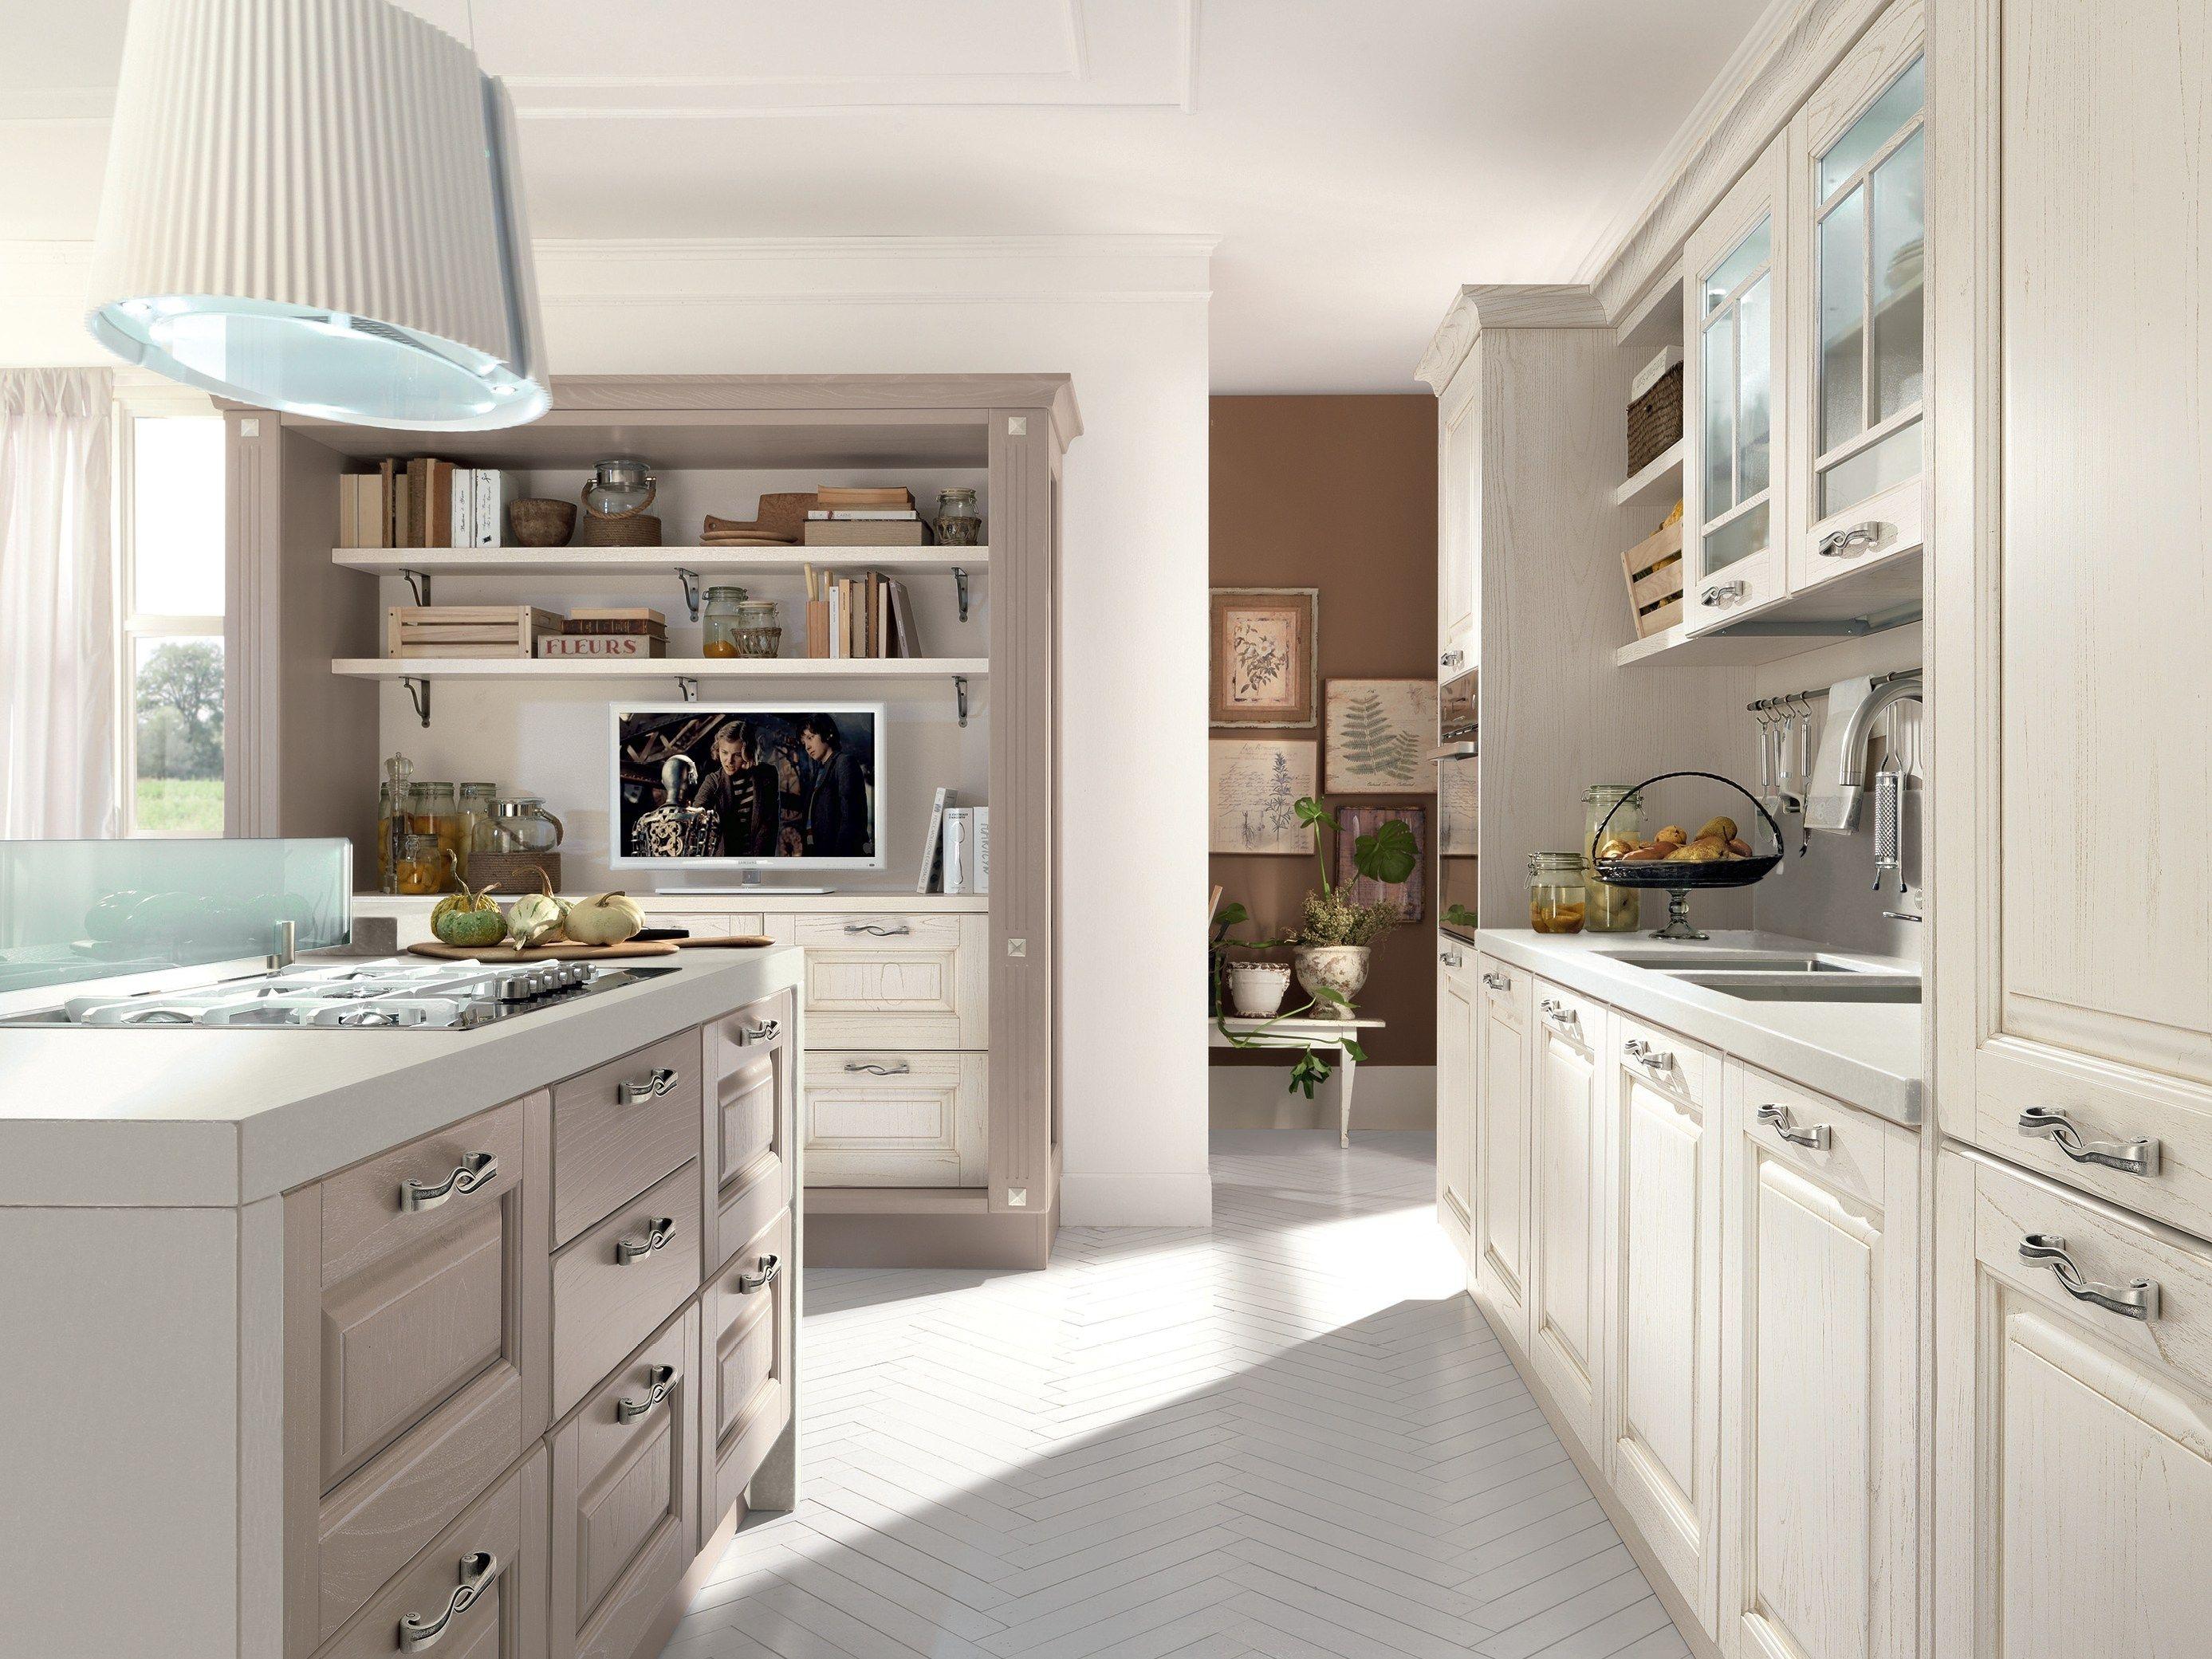 Laura cucina by cucine lube - Cucine con isole ...